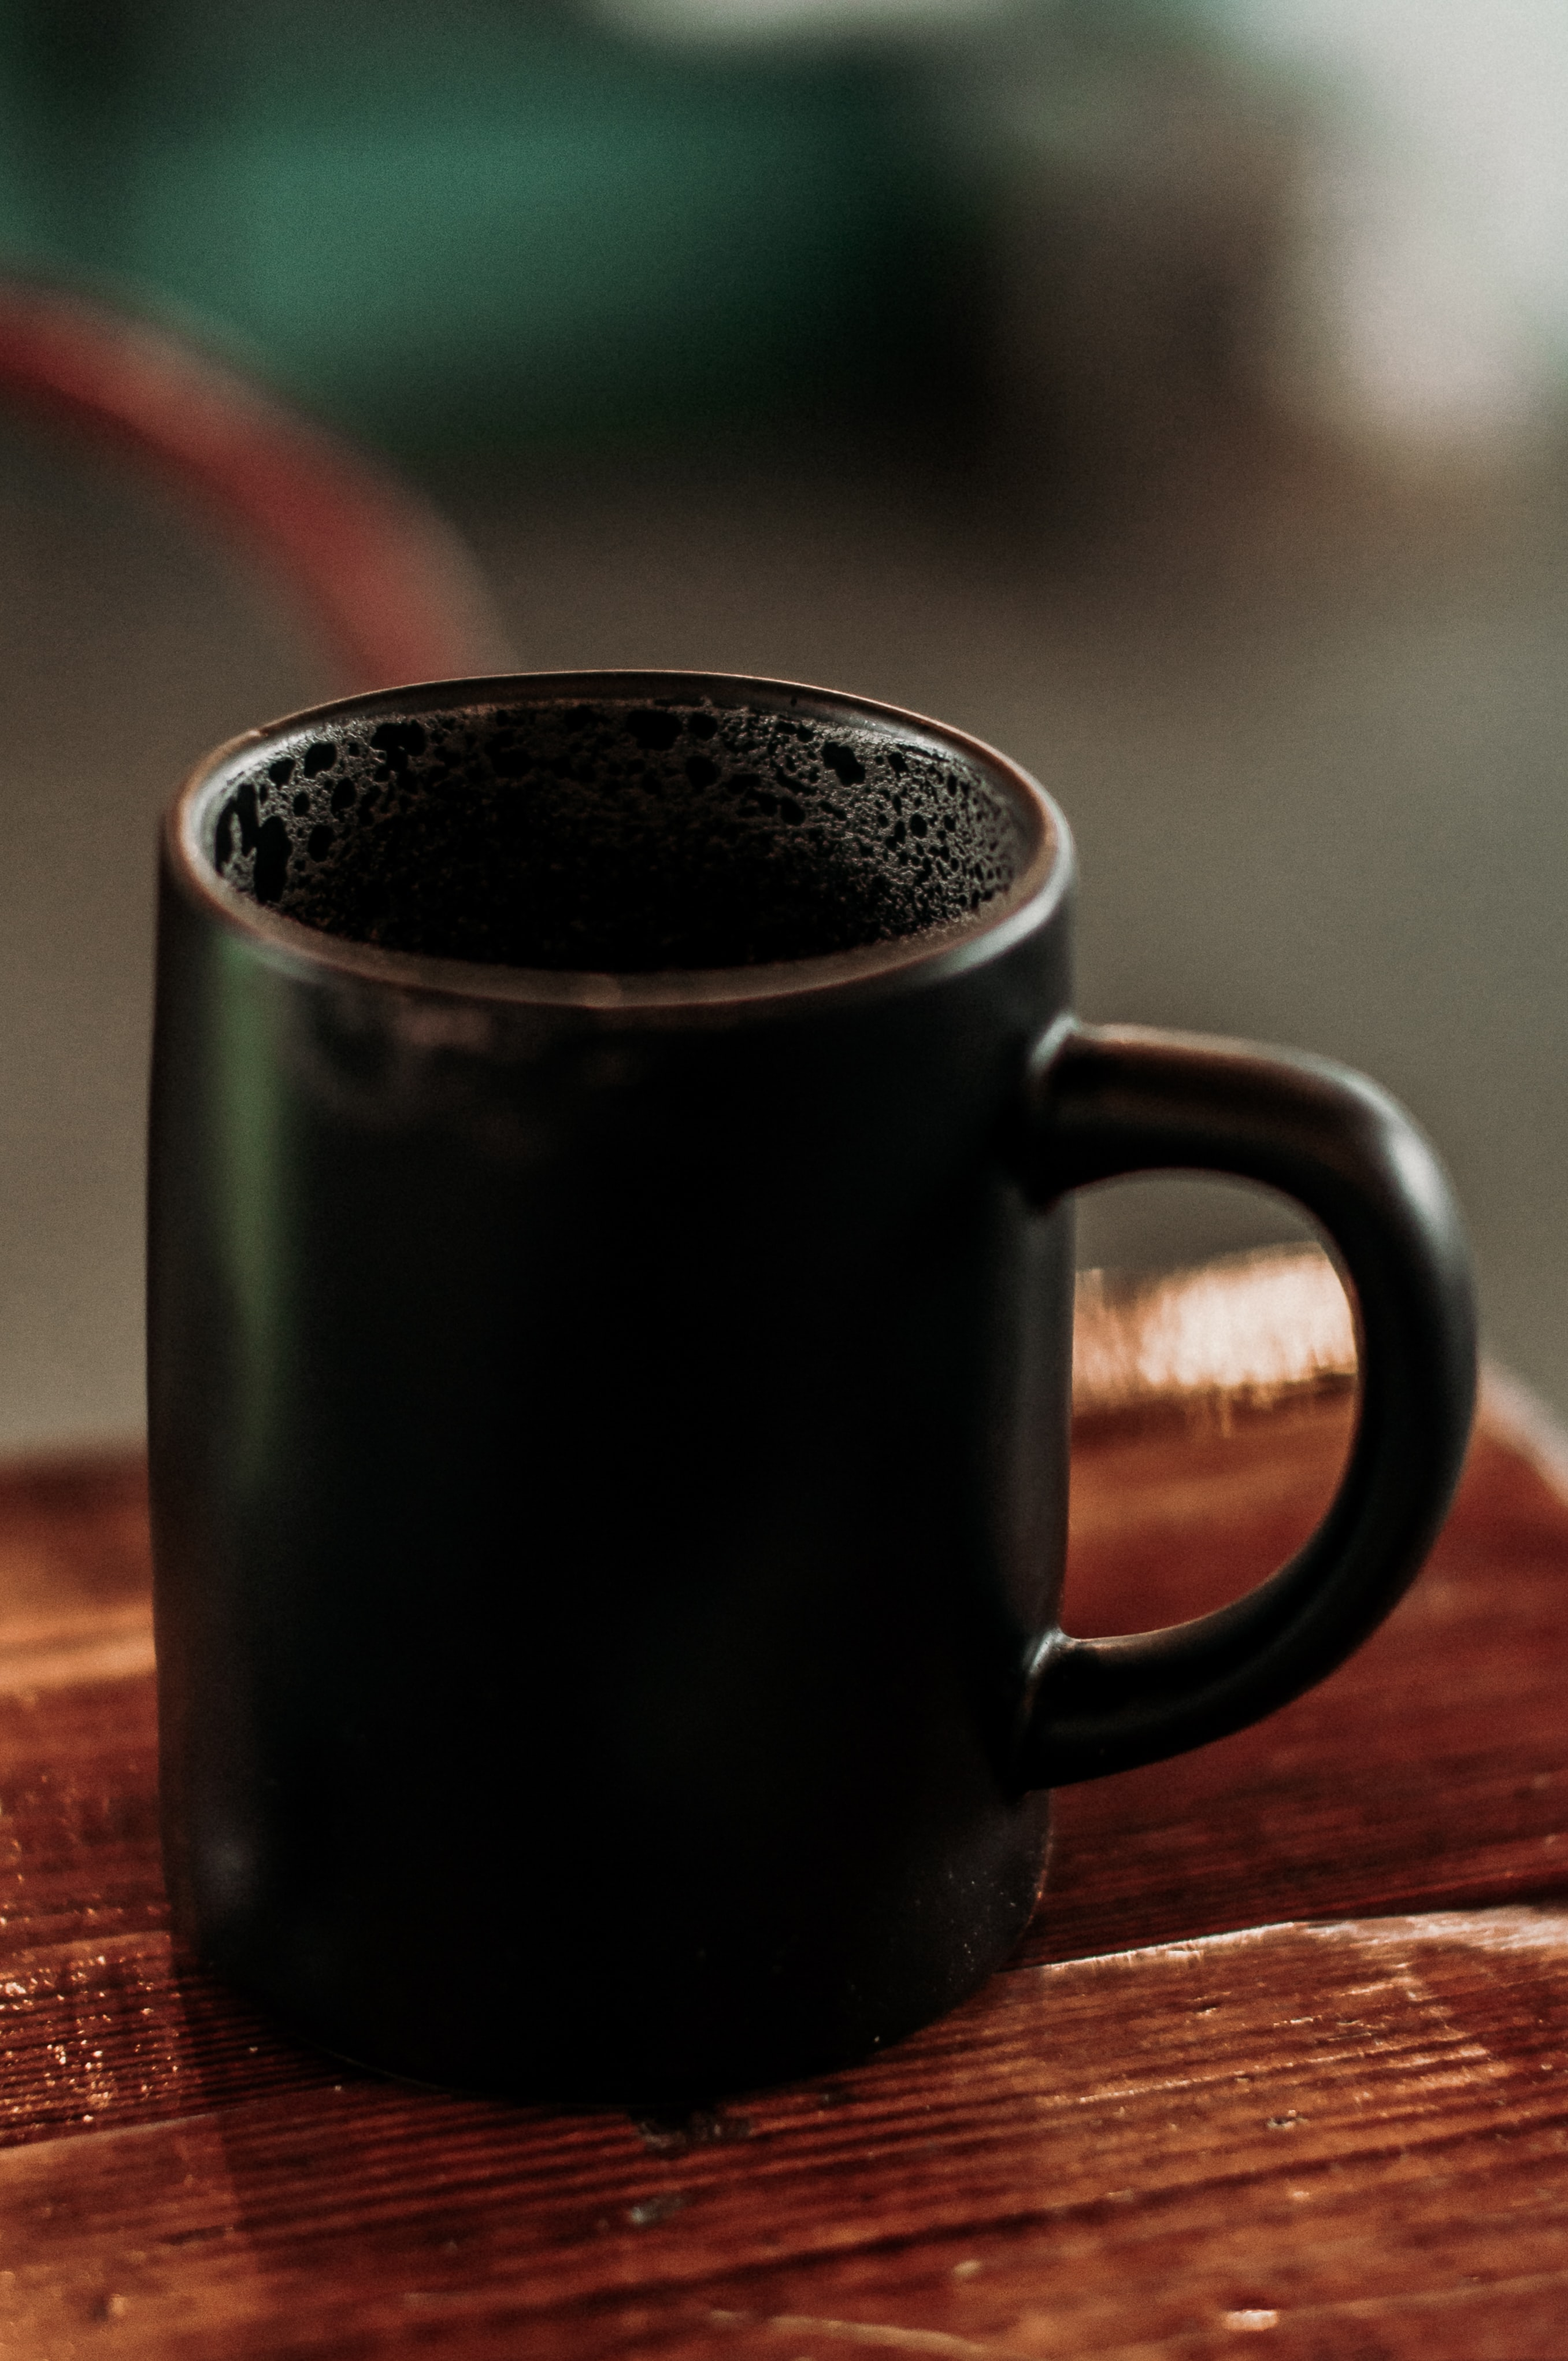 black ceramic mug on brown surface